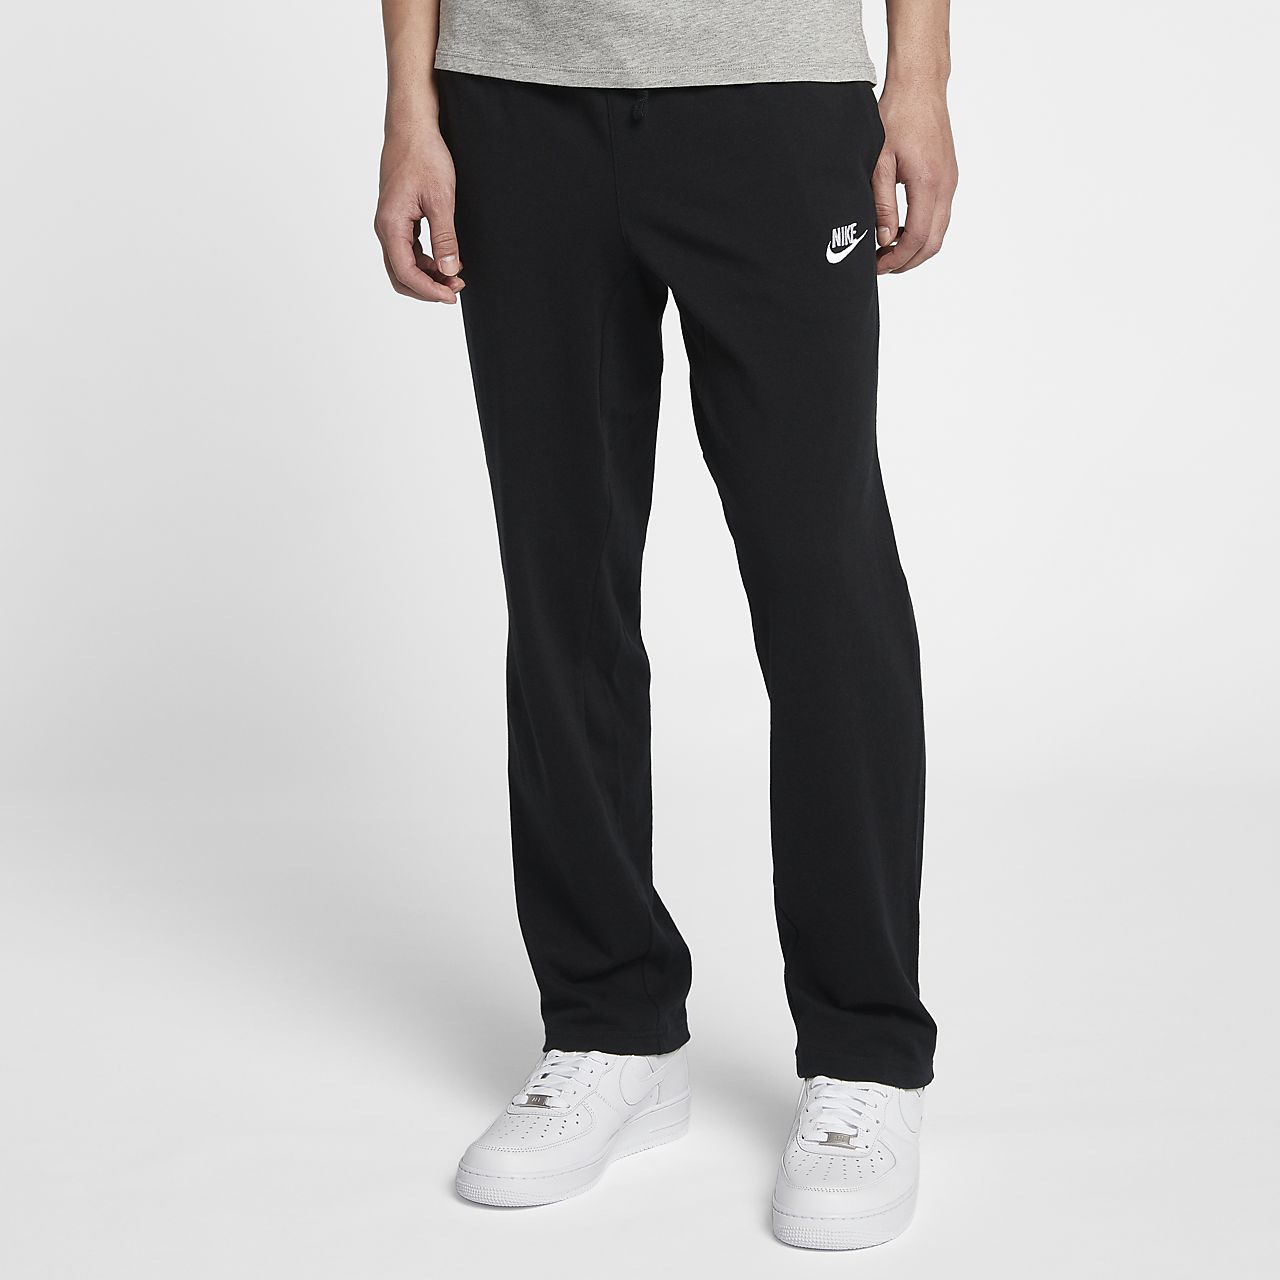 pantalon en maille coupe standard nike sportswear pour homme fr. Black Bedroom Furniture Sets. Home Design Ideas